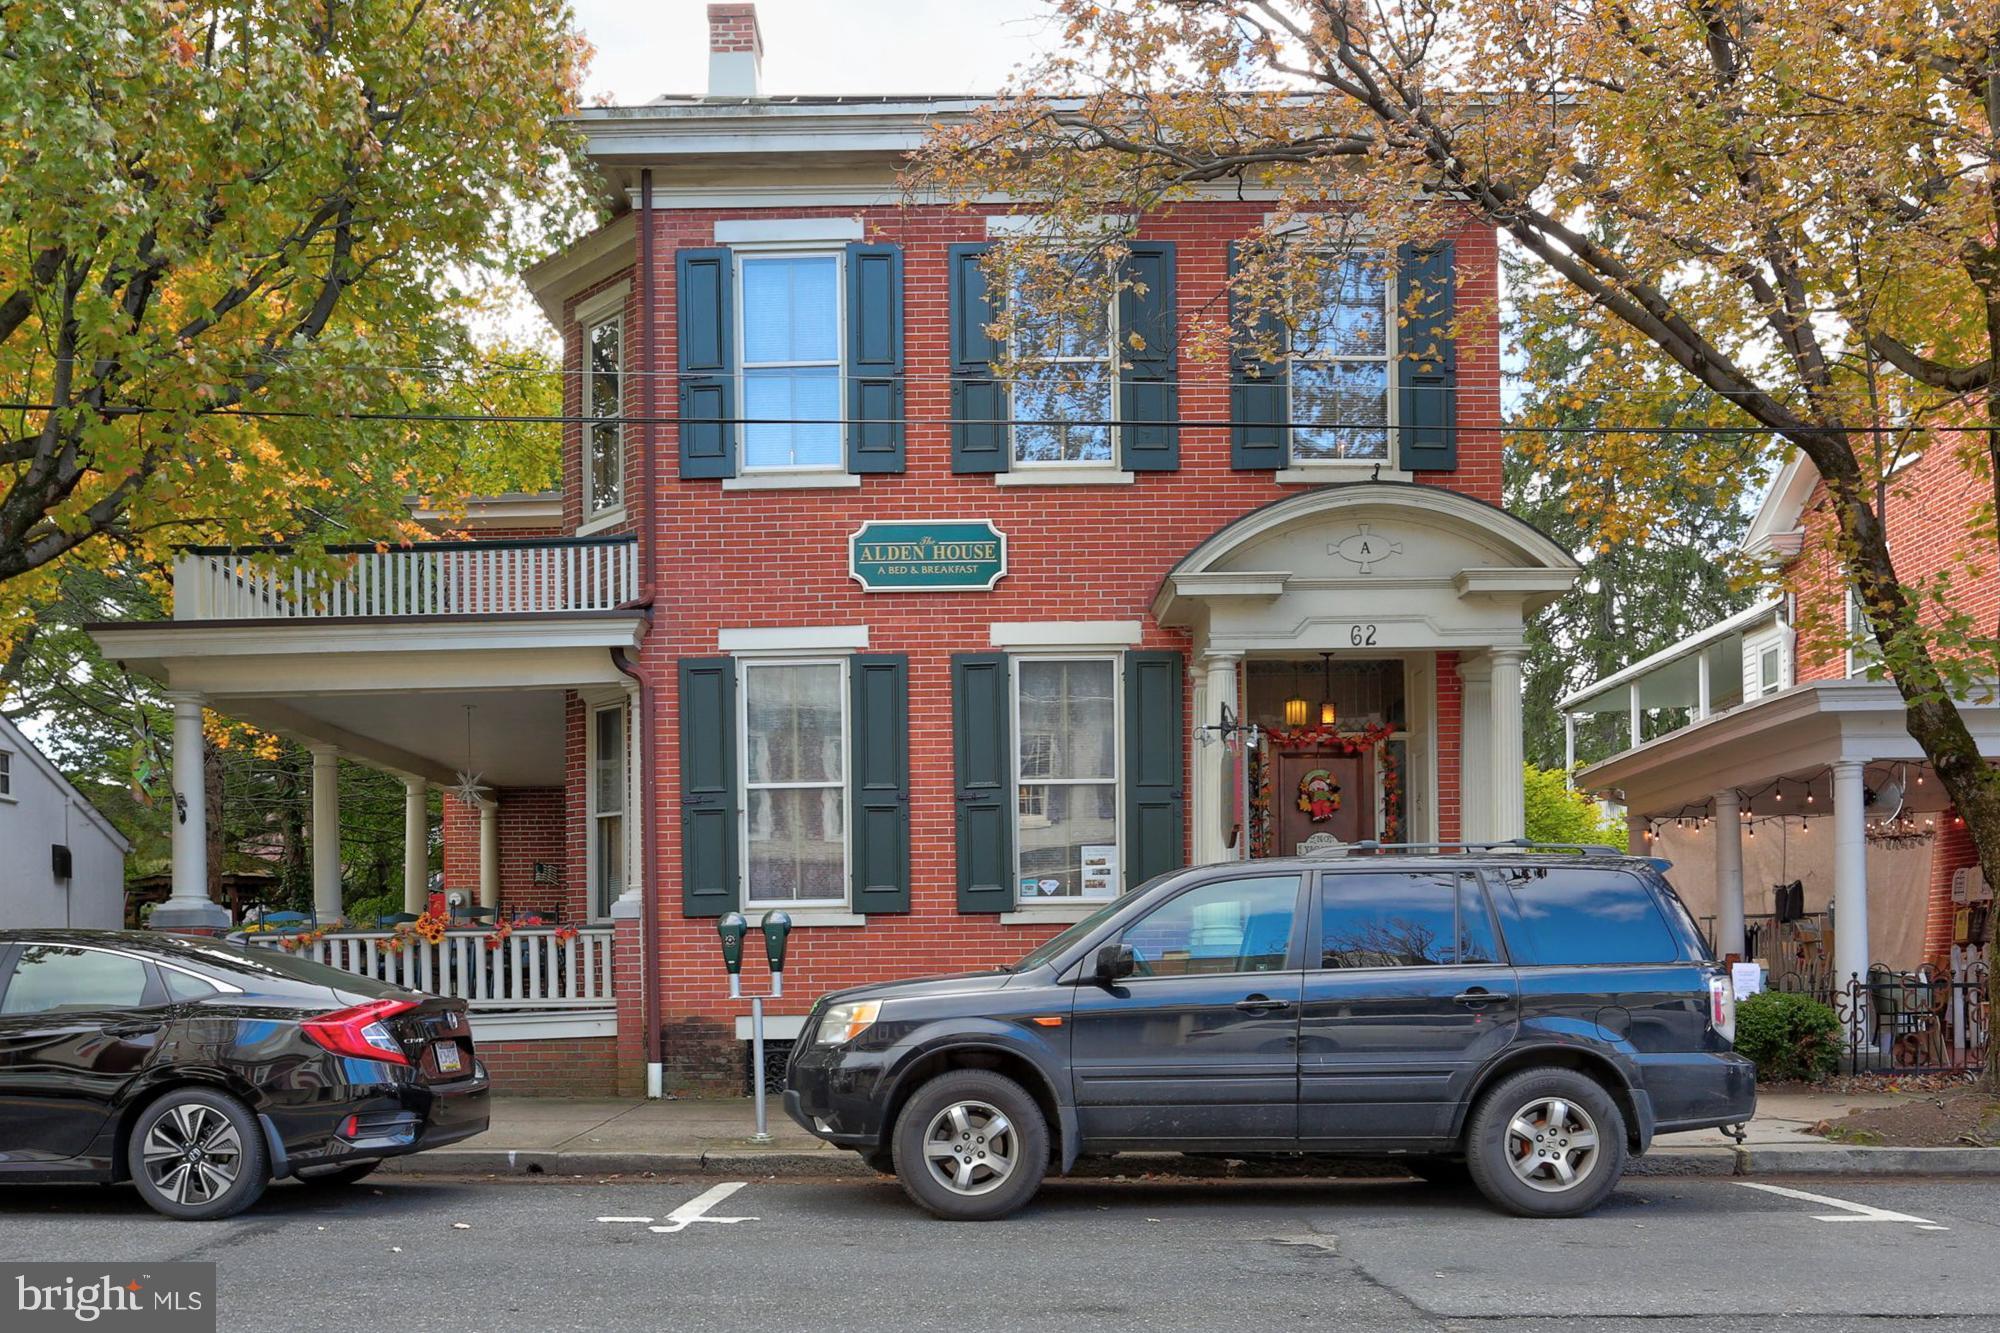 62 E MAIN STREET, LITITZ, PA 17543